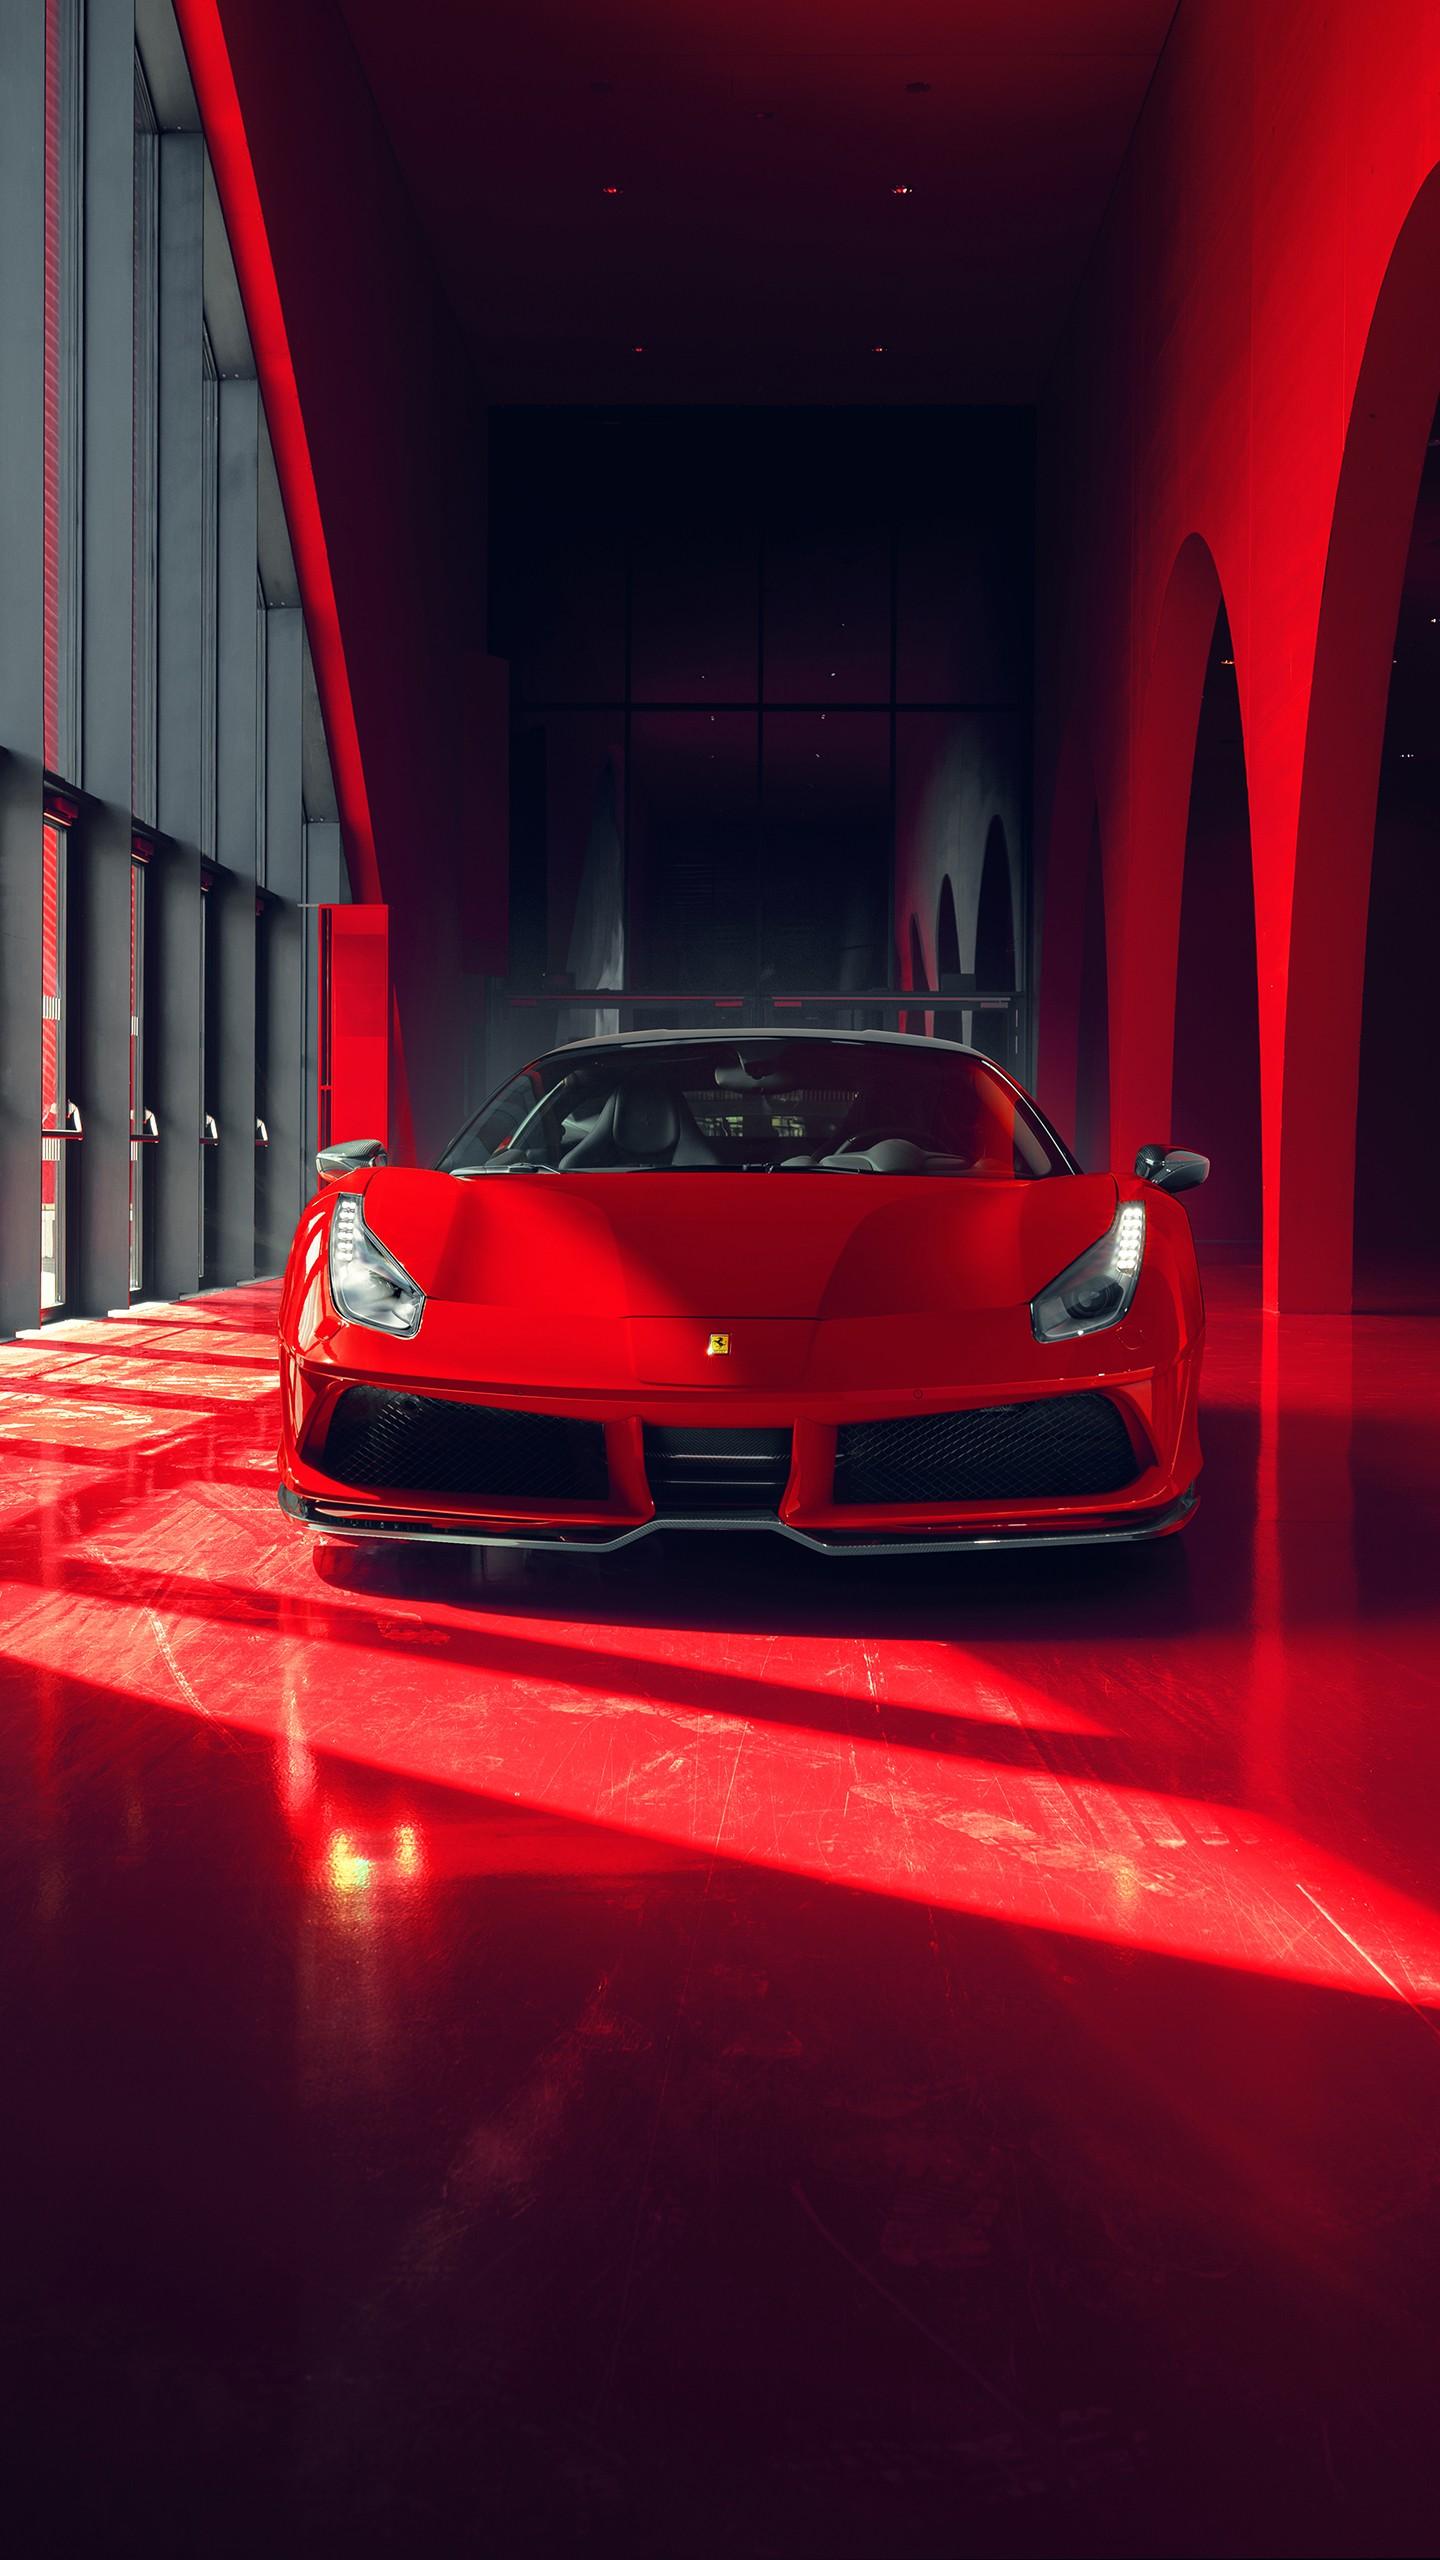 Iphone 5s Retina Wallpaper 2018 Pogea Racing Fplus Corsa Ferrari 488 Gtb Wallpapers